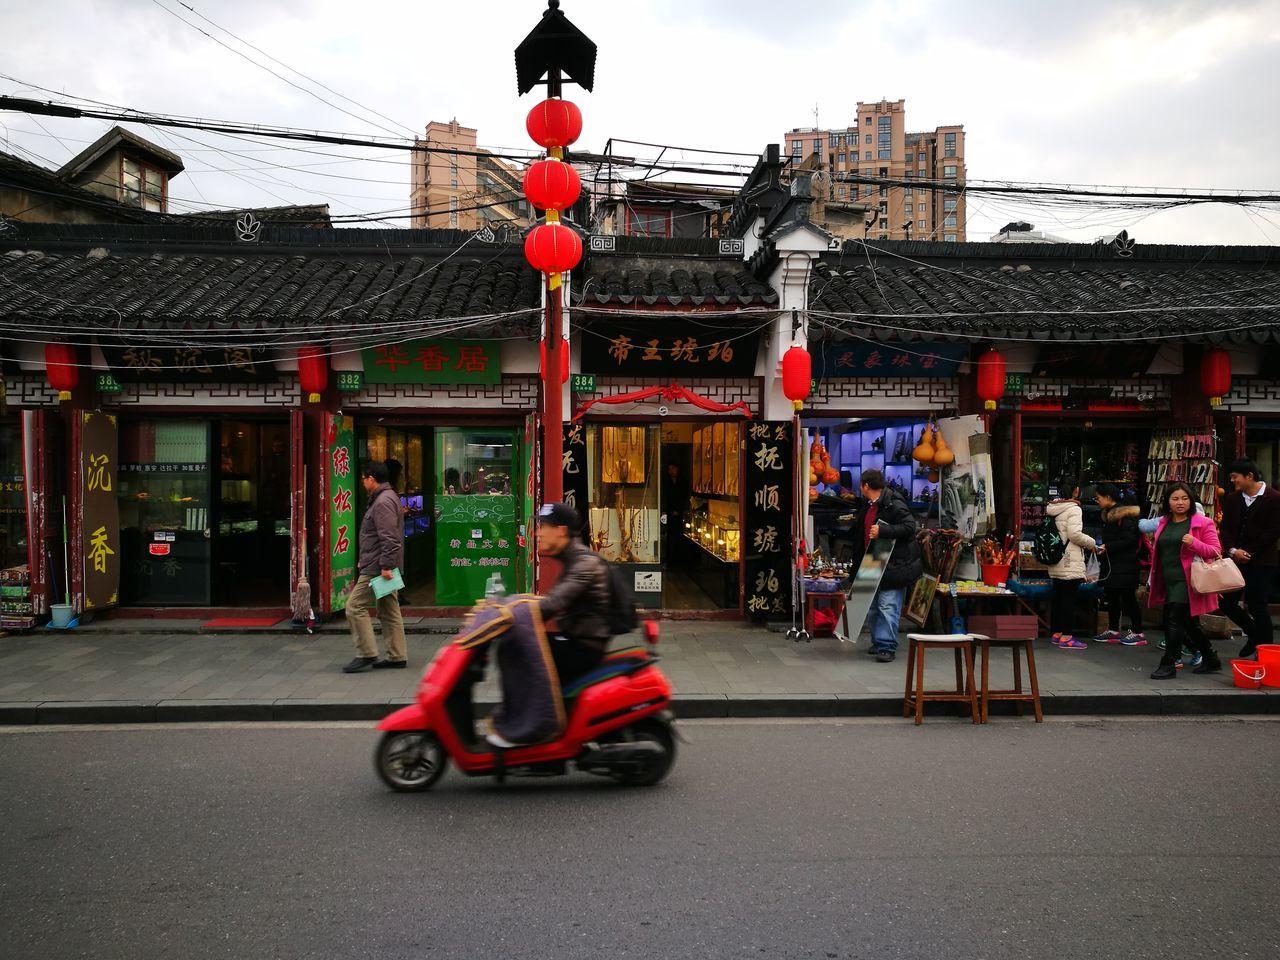 Bazaar China Chinatown Chinese Lantern Cultures Market Red Scooter Shanghai Shanghai Chinatown Street